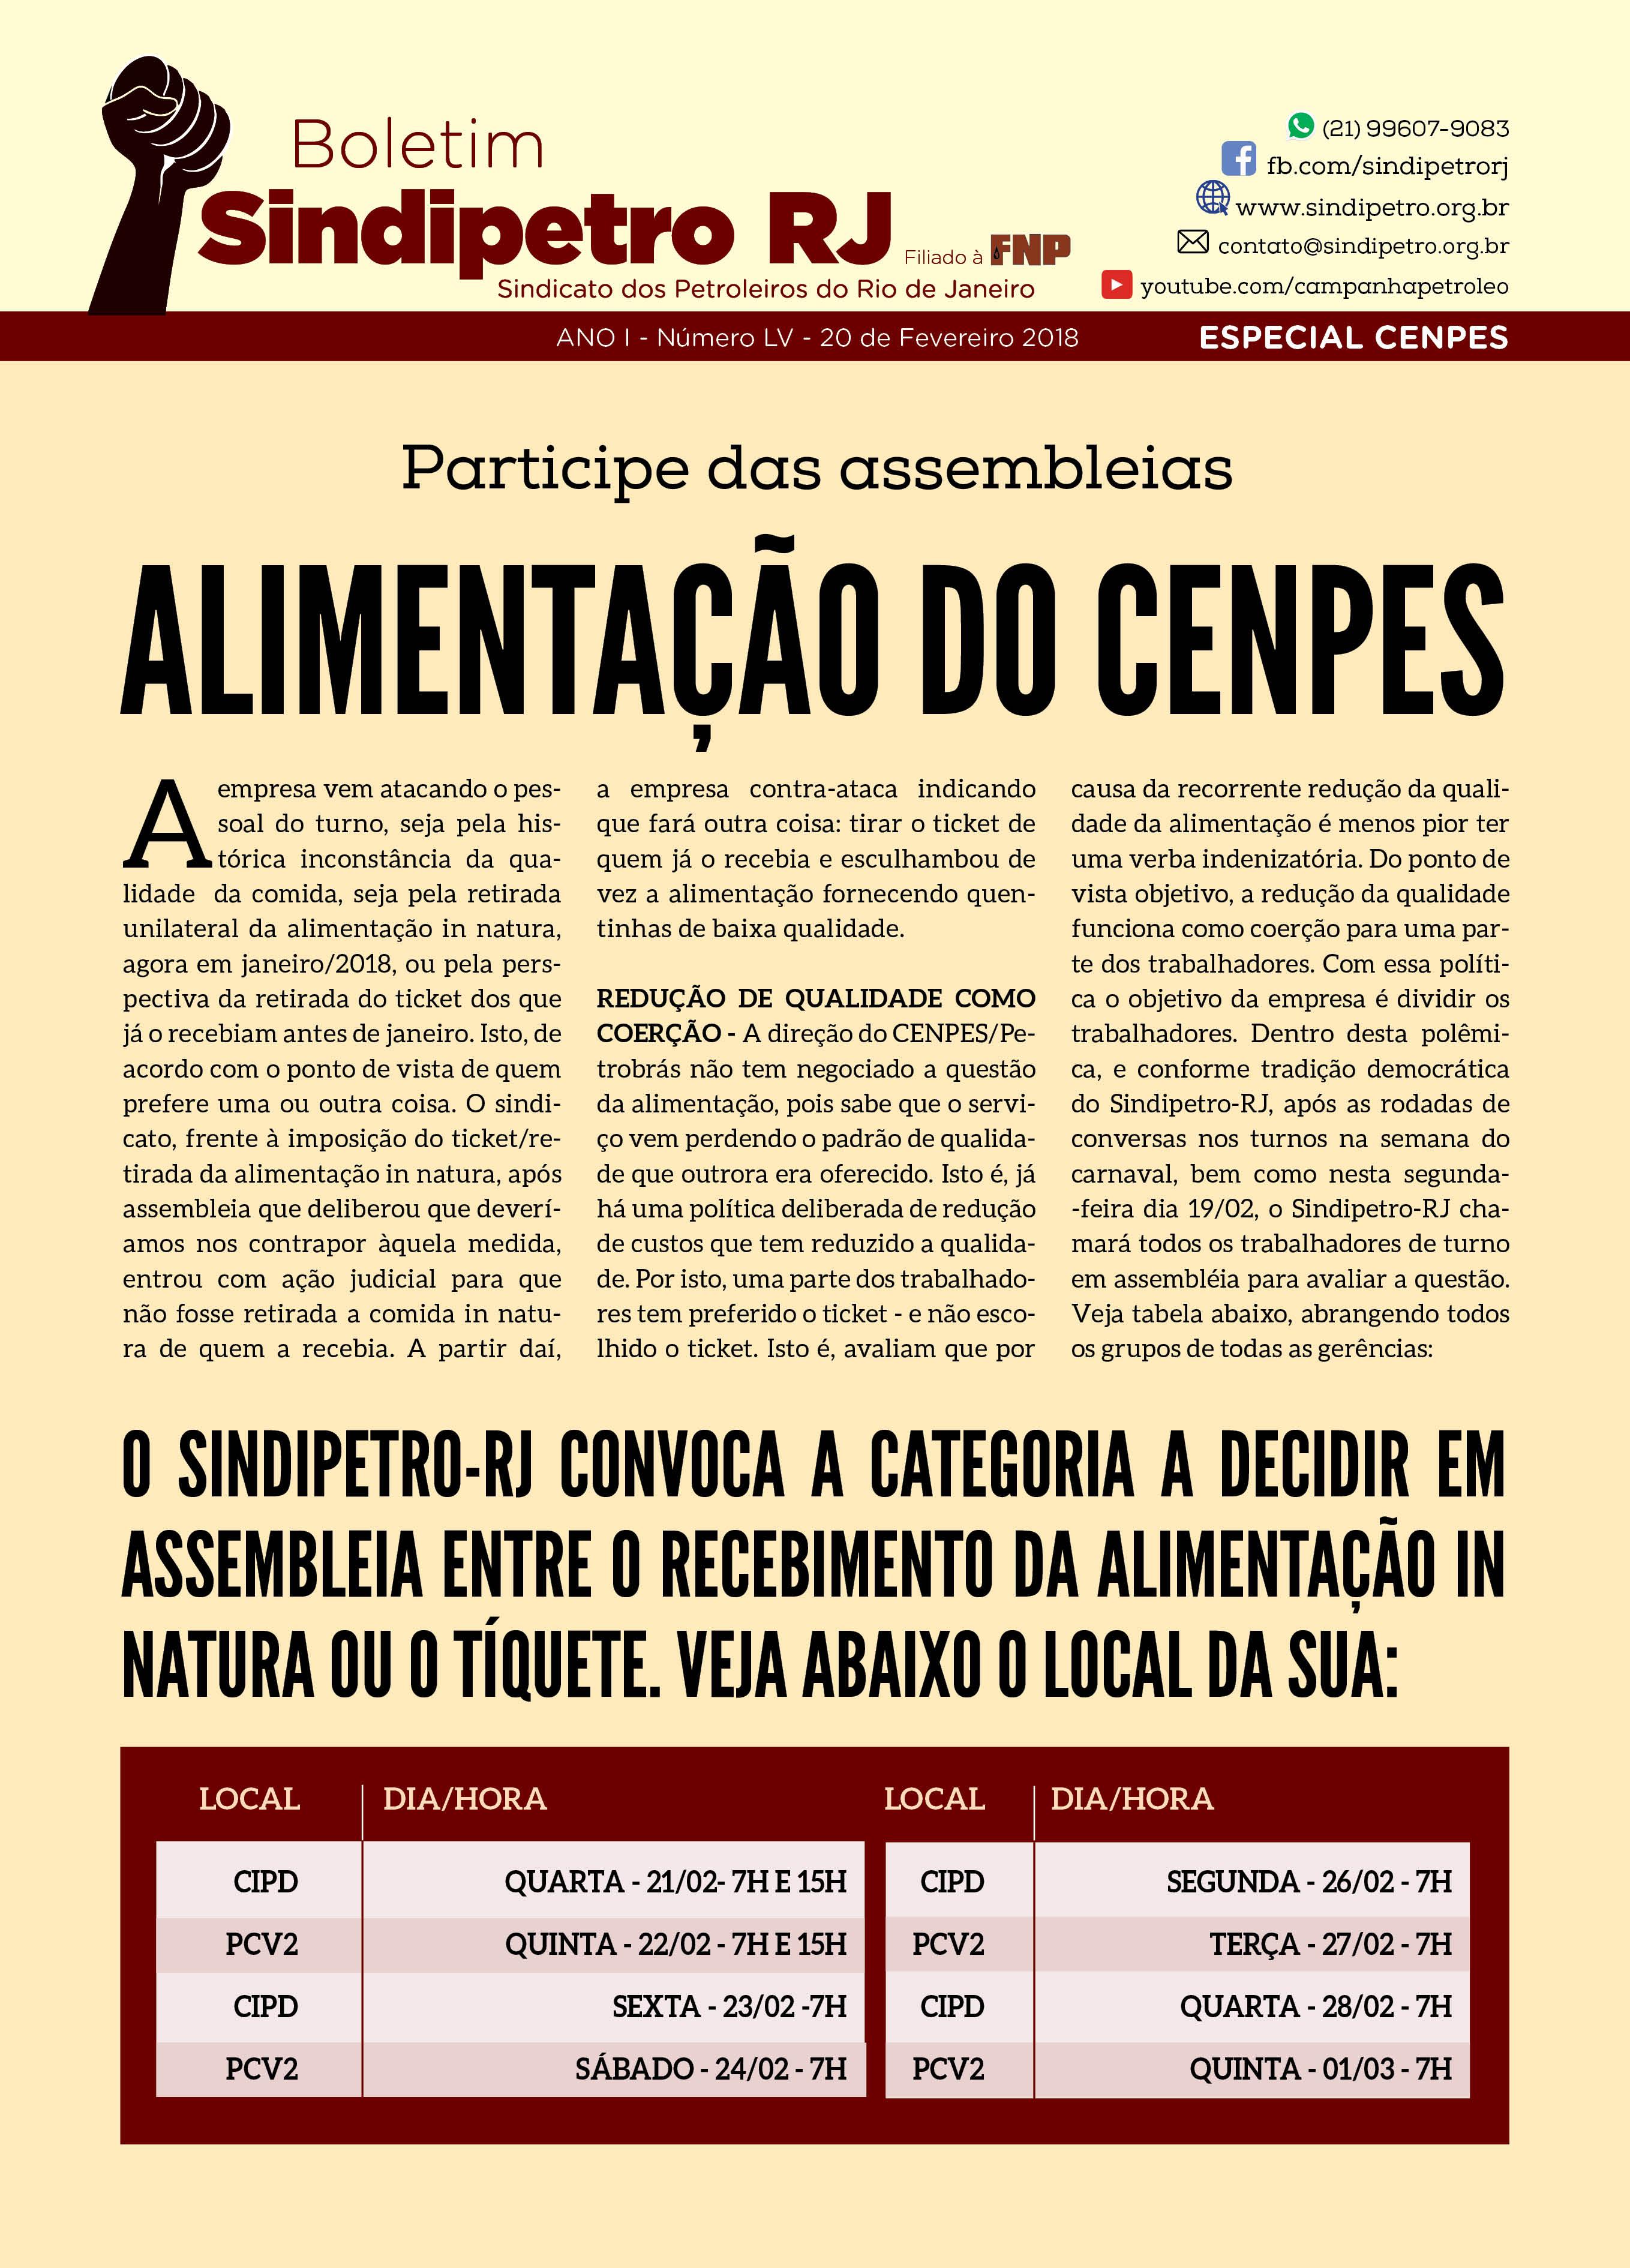 Boletim 55 Boletim Sindipetro 55 NOVO ESPECIAL CENPES